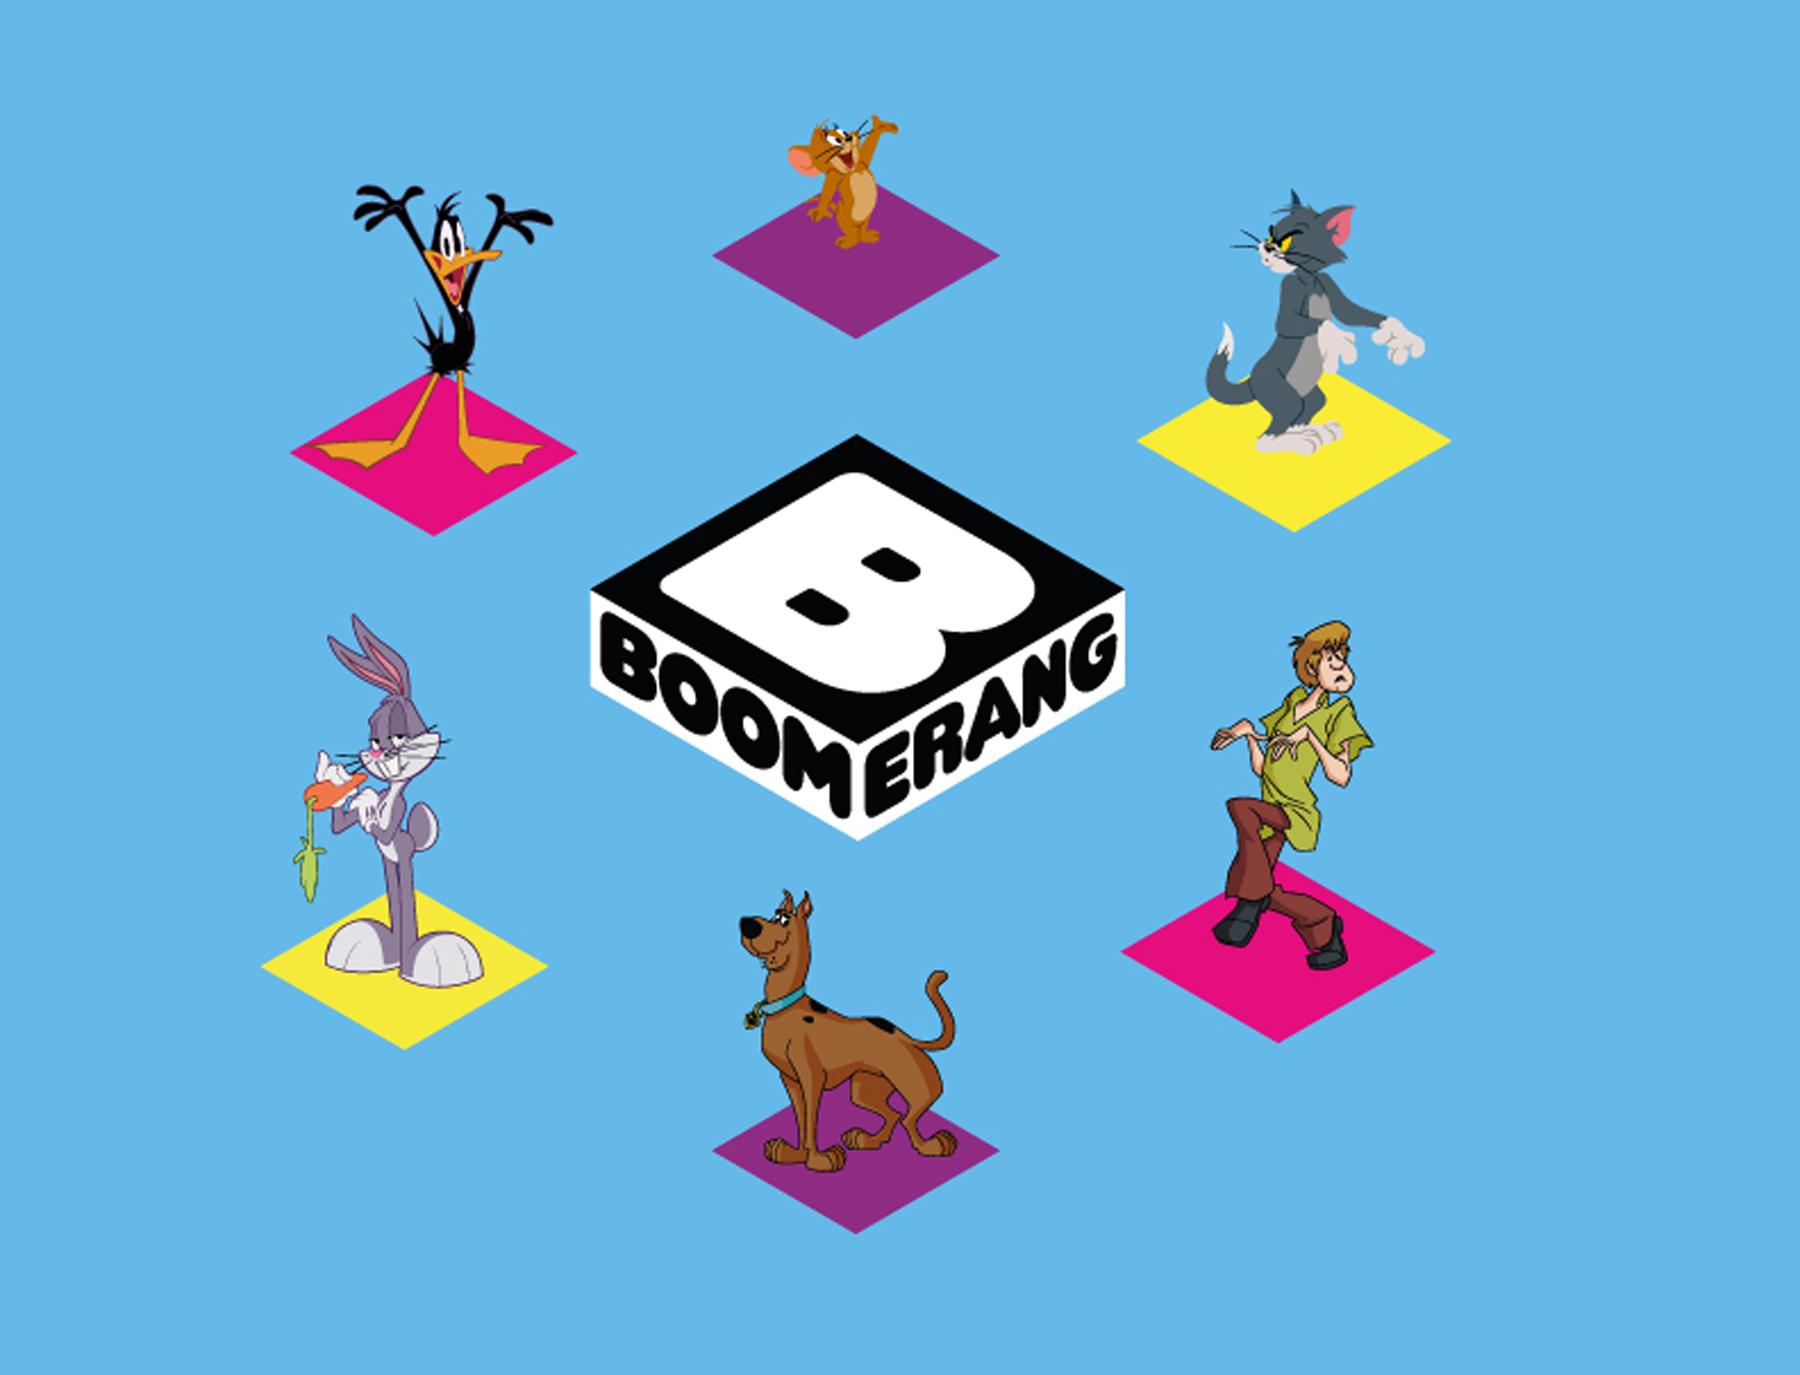 Boomerang France  YouTube